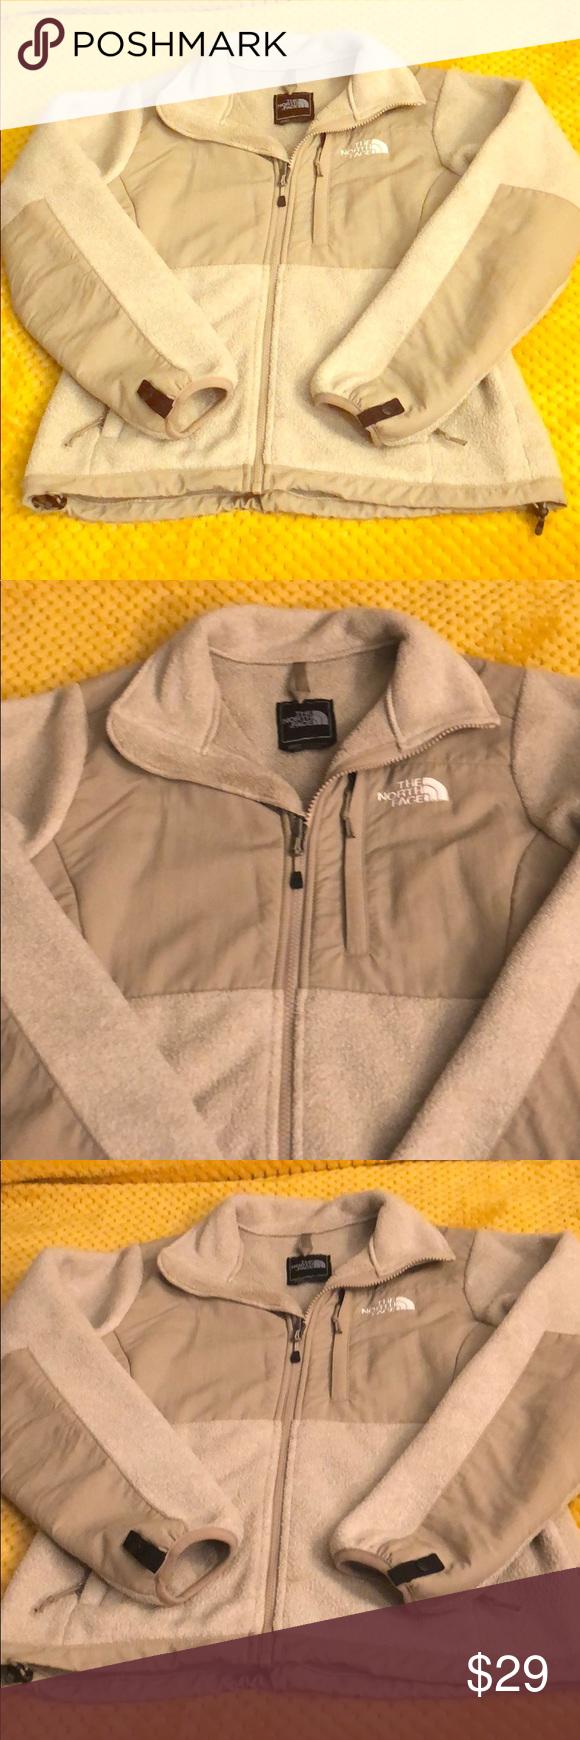 The North Face Fleece Jacket Beige Cream Size Xs North Face Fleece Jacket North Face Fleece Clothes Design [ 1740 x 580 Pixel ]